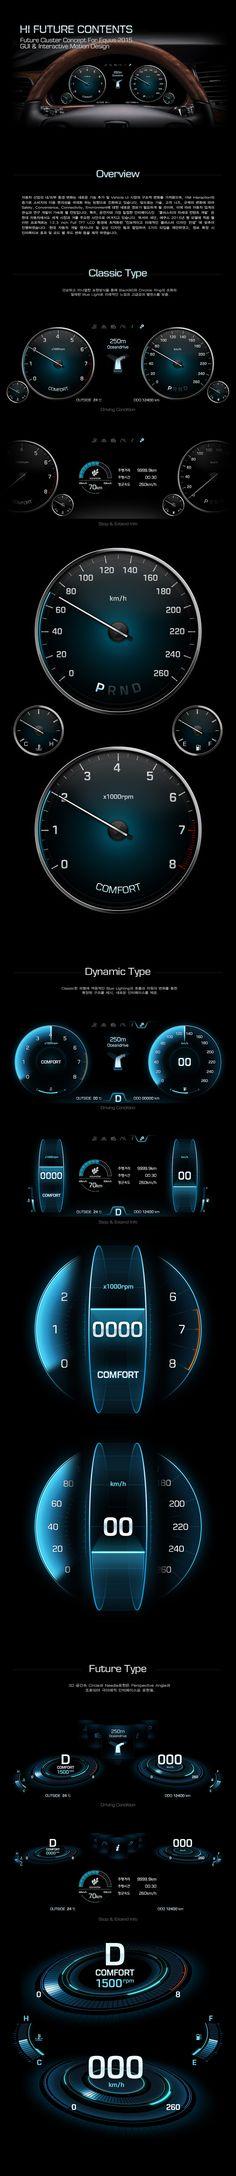 Hyundai Motors 'HI Future Cluster' Interface GUI & Motion Design